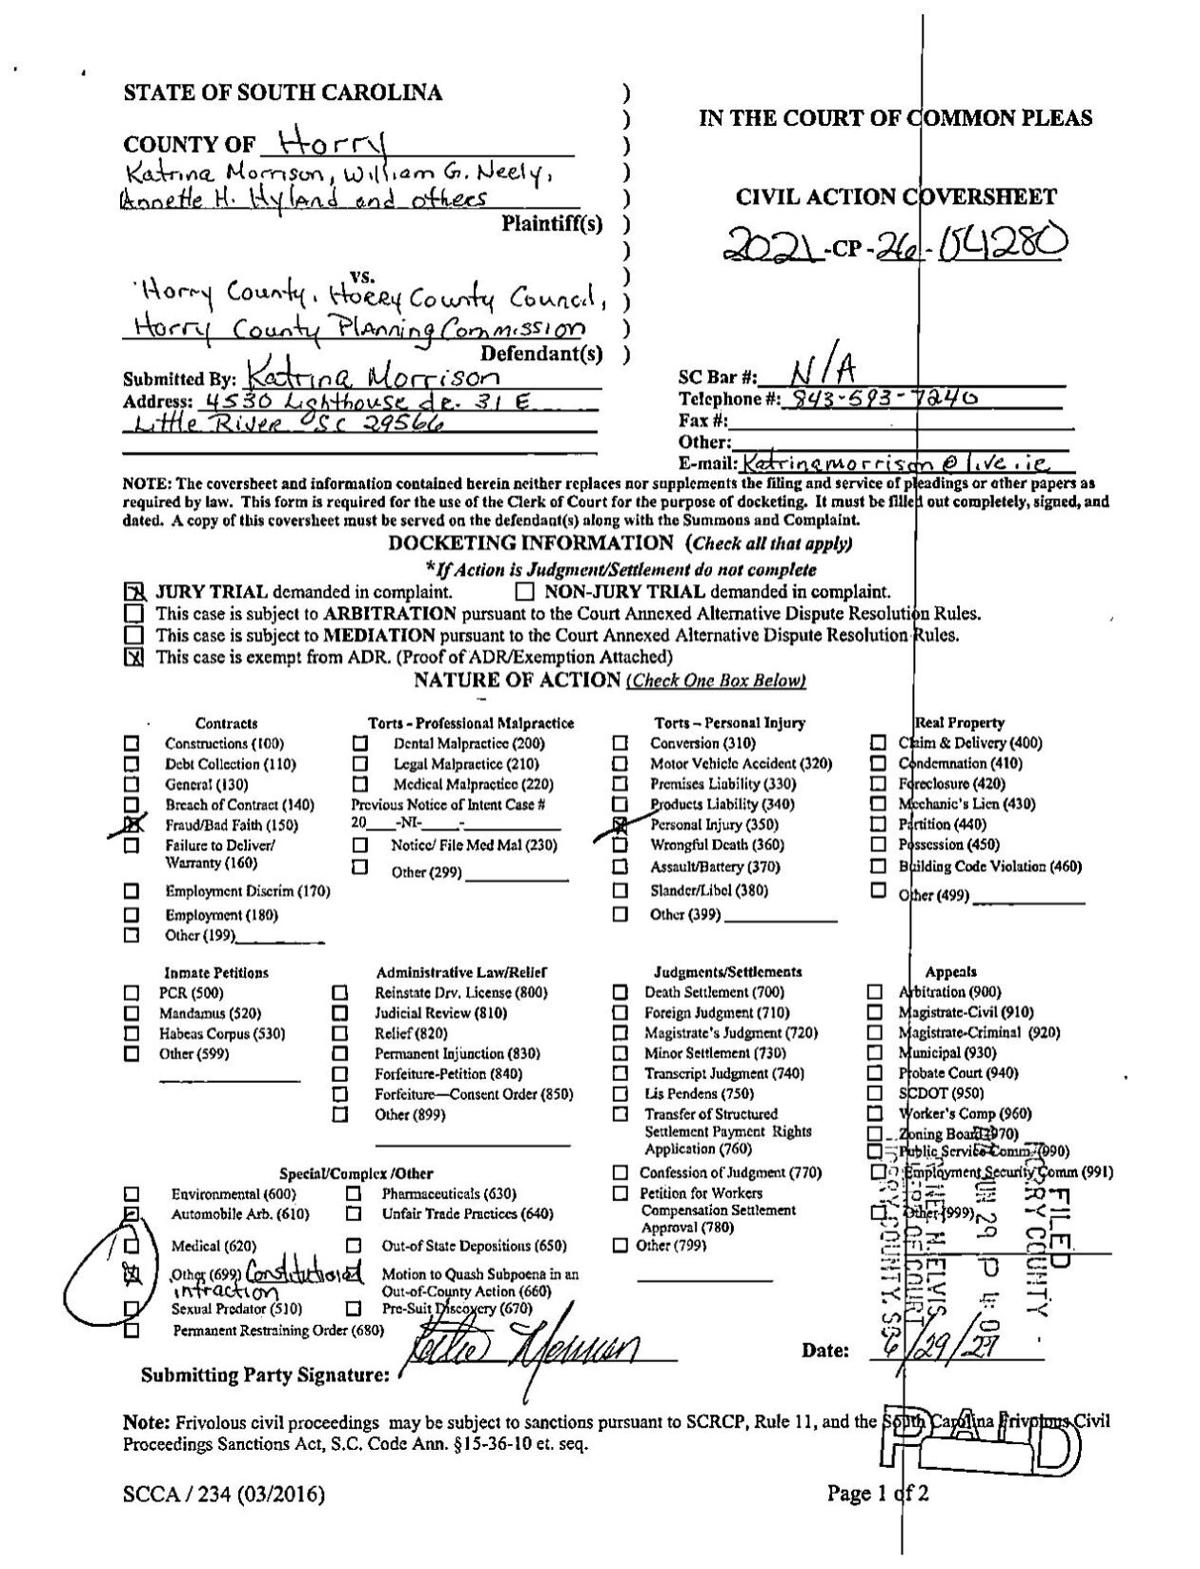 Katrina Morrison's lawsuit against Horry County